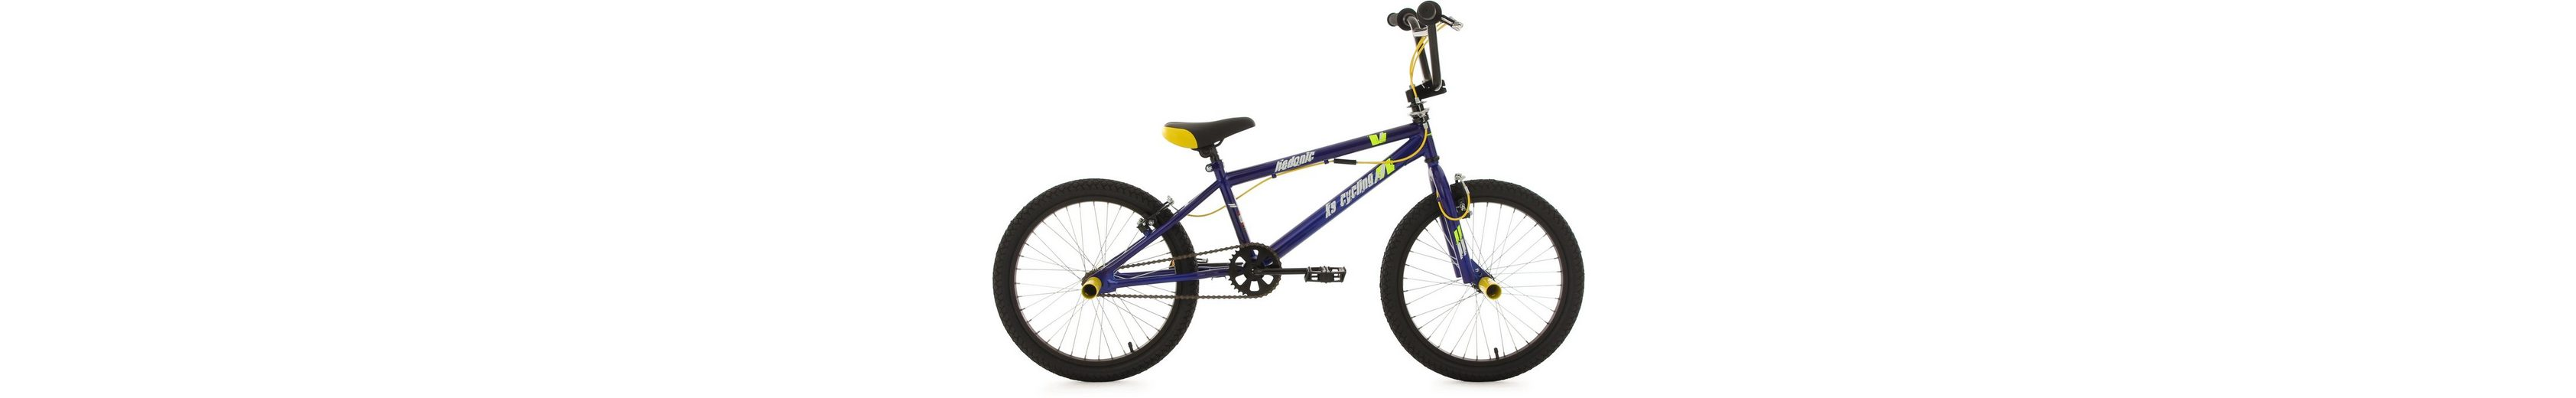 KS Cycling BMX Fahrrad, 20 Zoll, blau-gelb, »Hedonic«